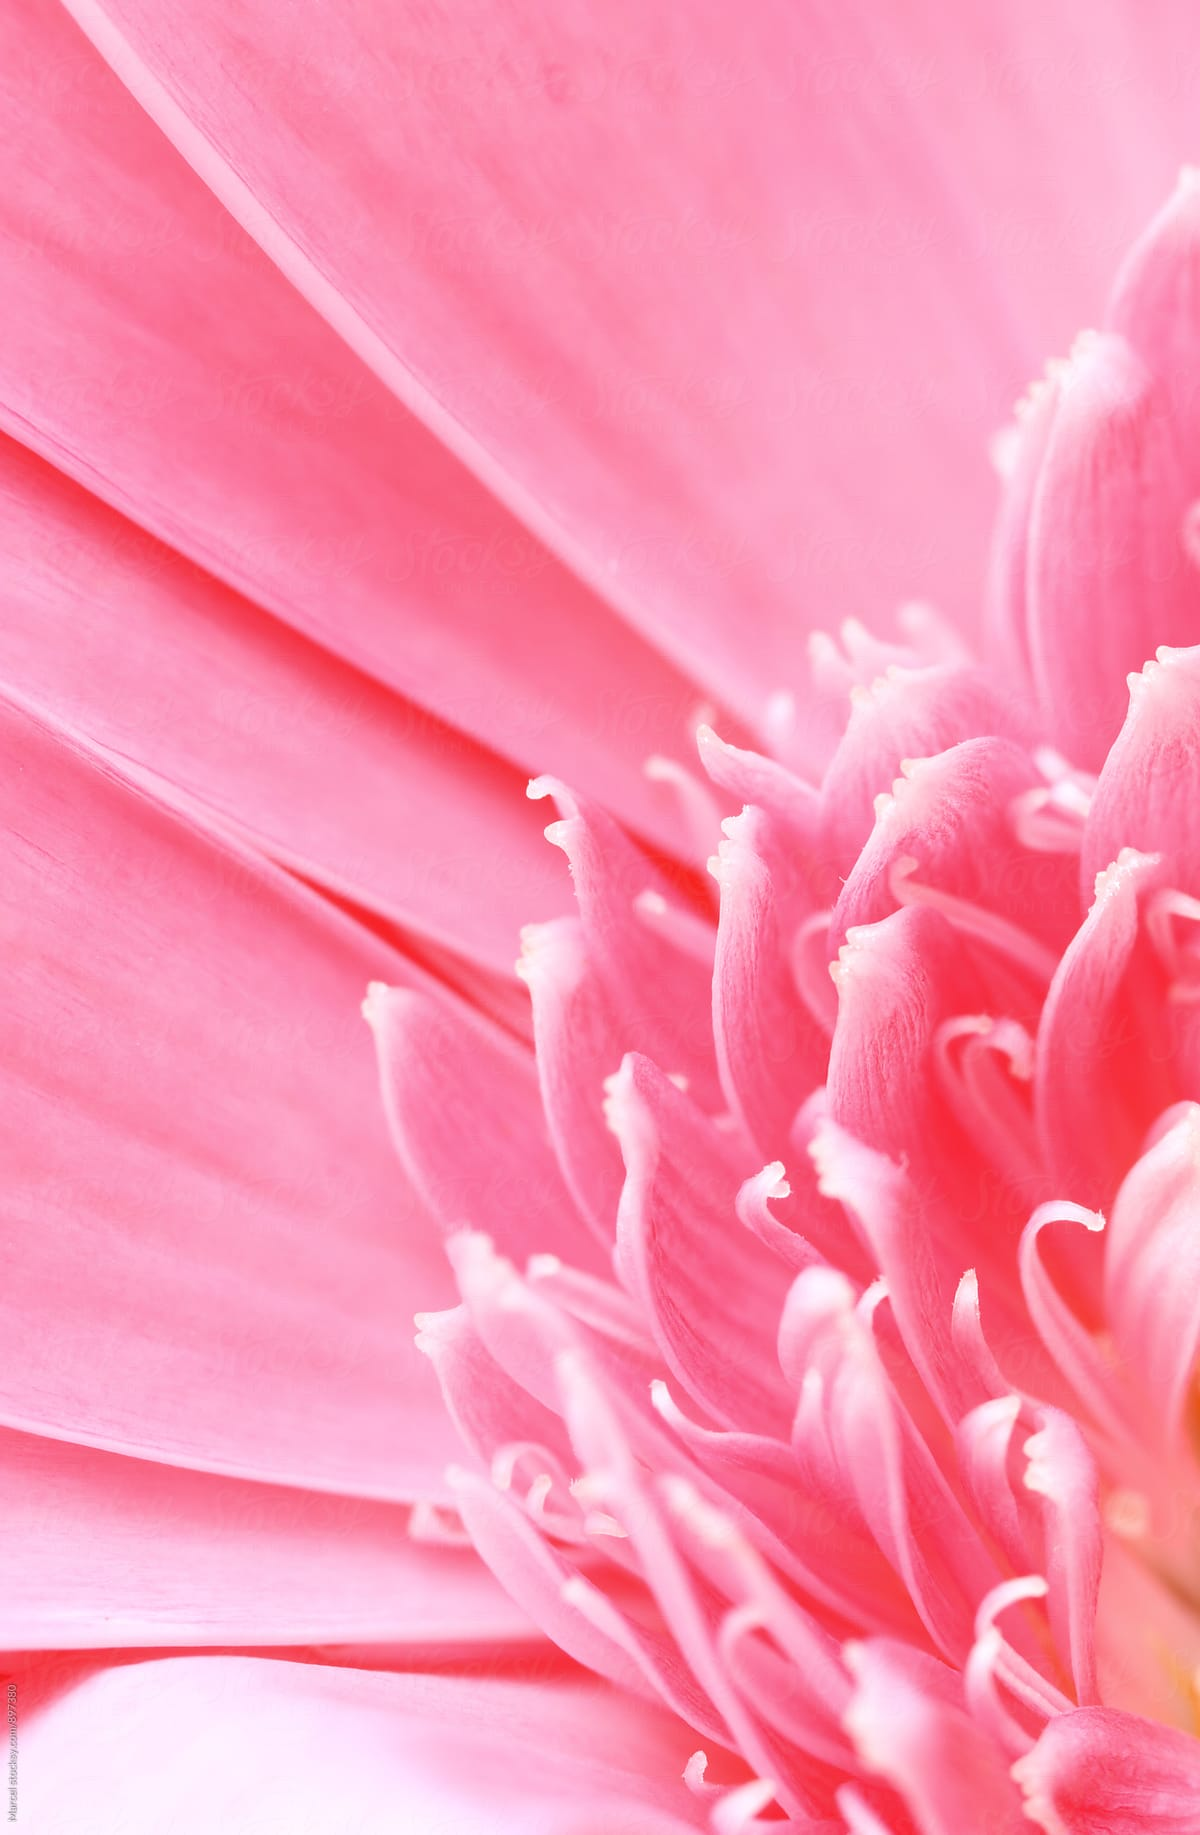 Pink Gerbera Daisy Macro Stocksy United